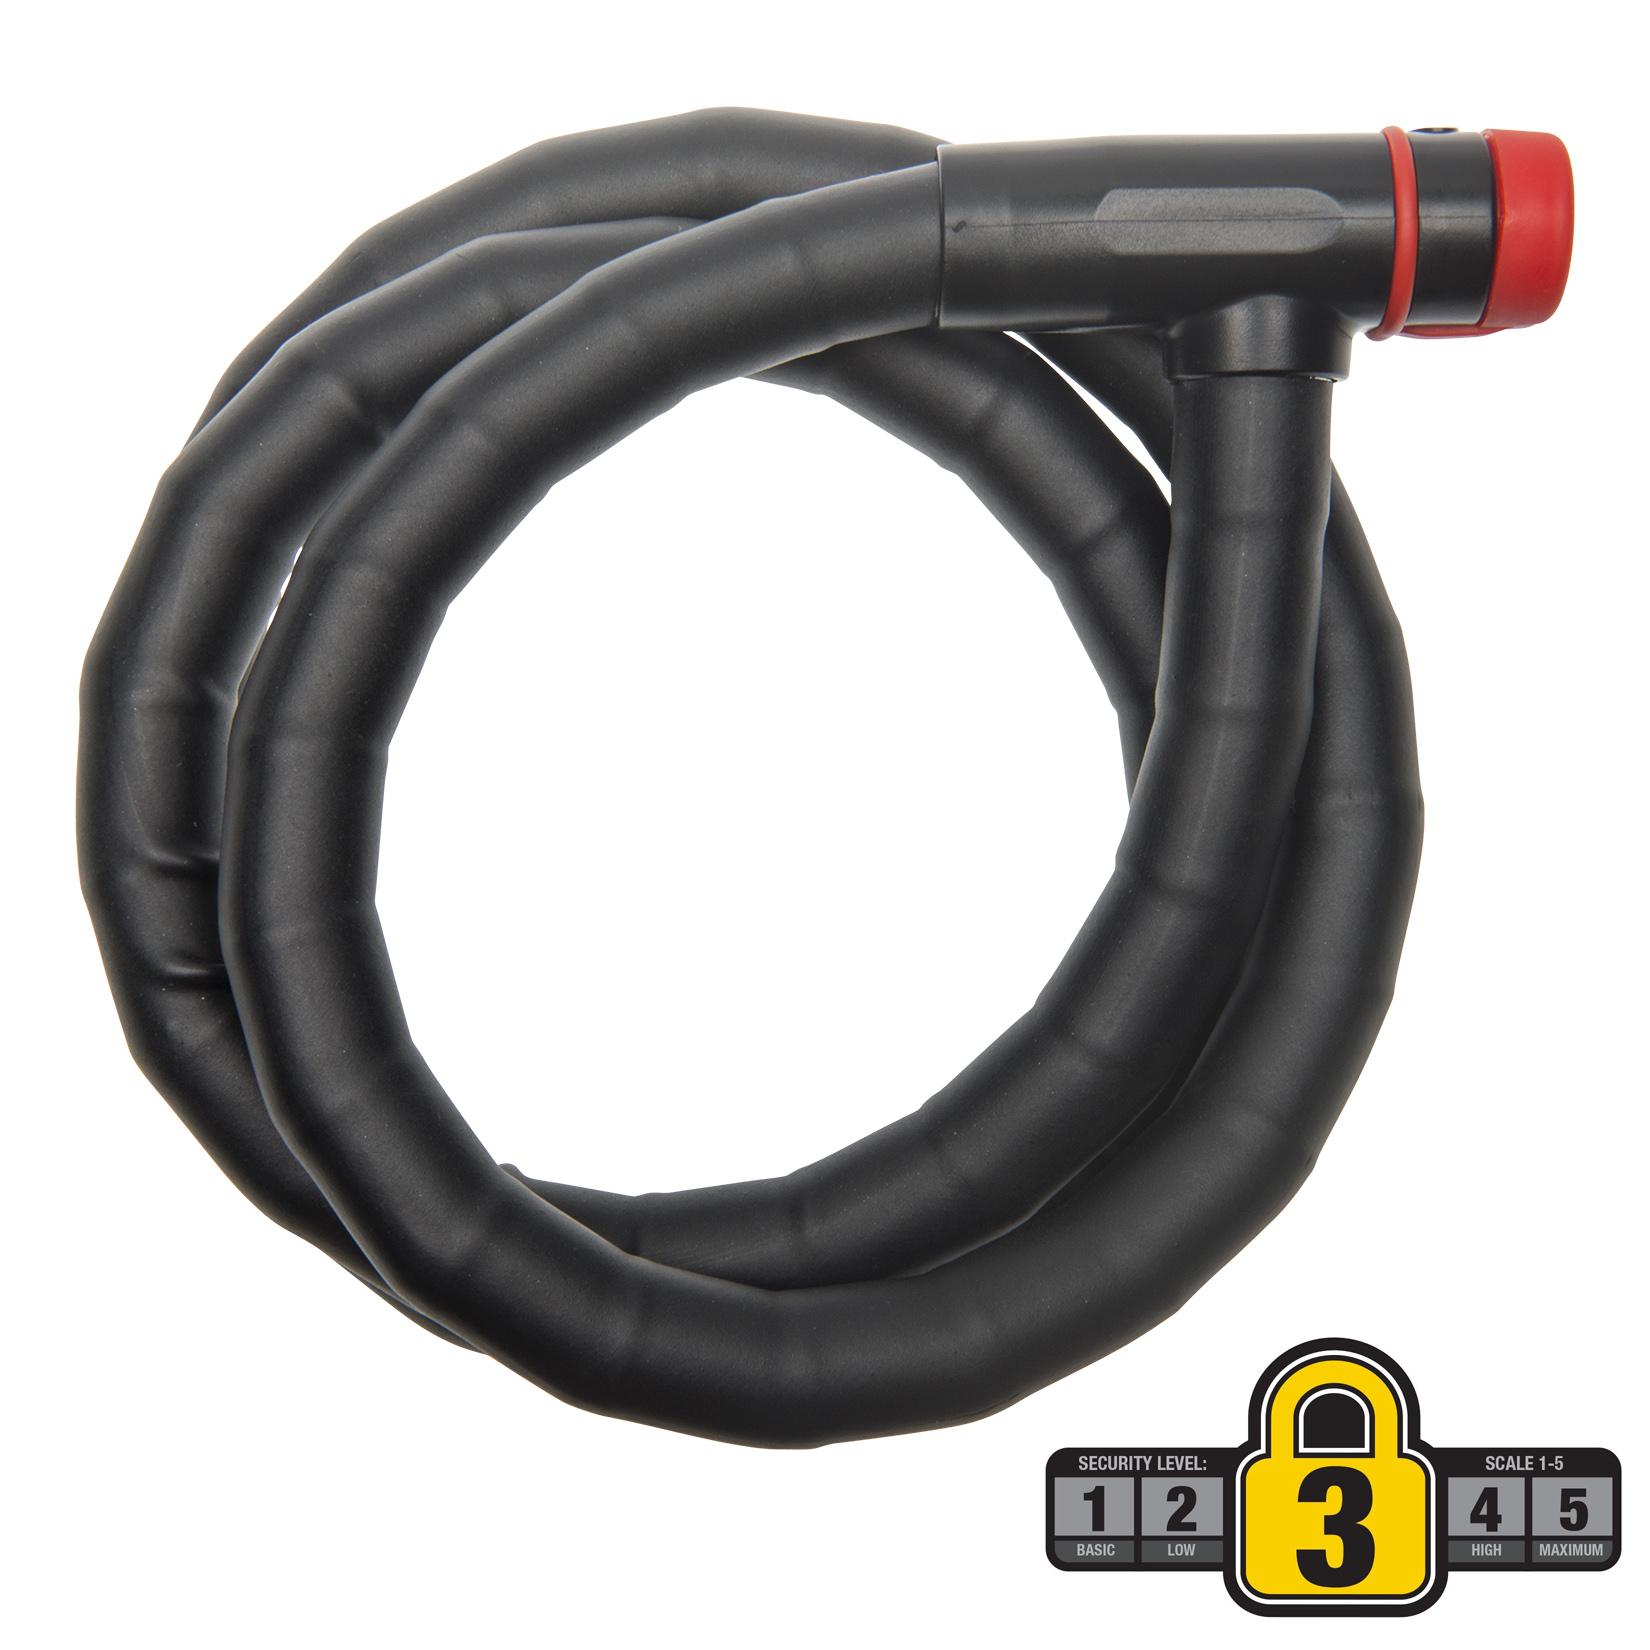 Bell Sports Ballistic 500 4' x 18mm Heavy-Duty Key Cable Bicycle Lock, Black